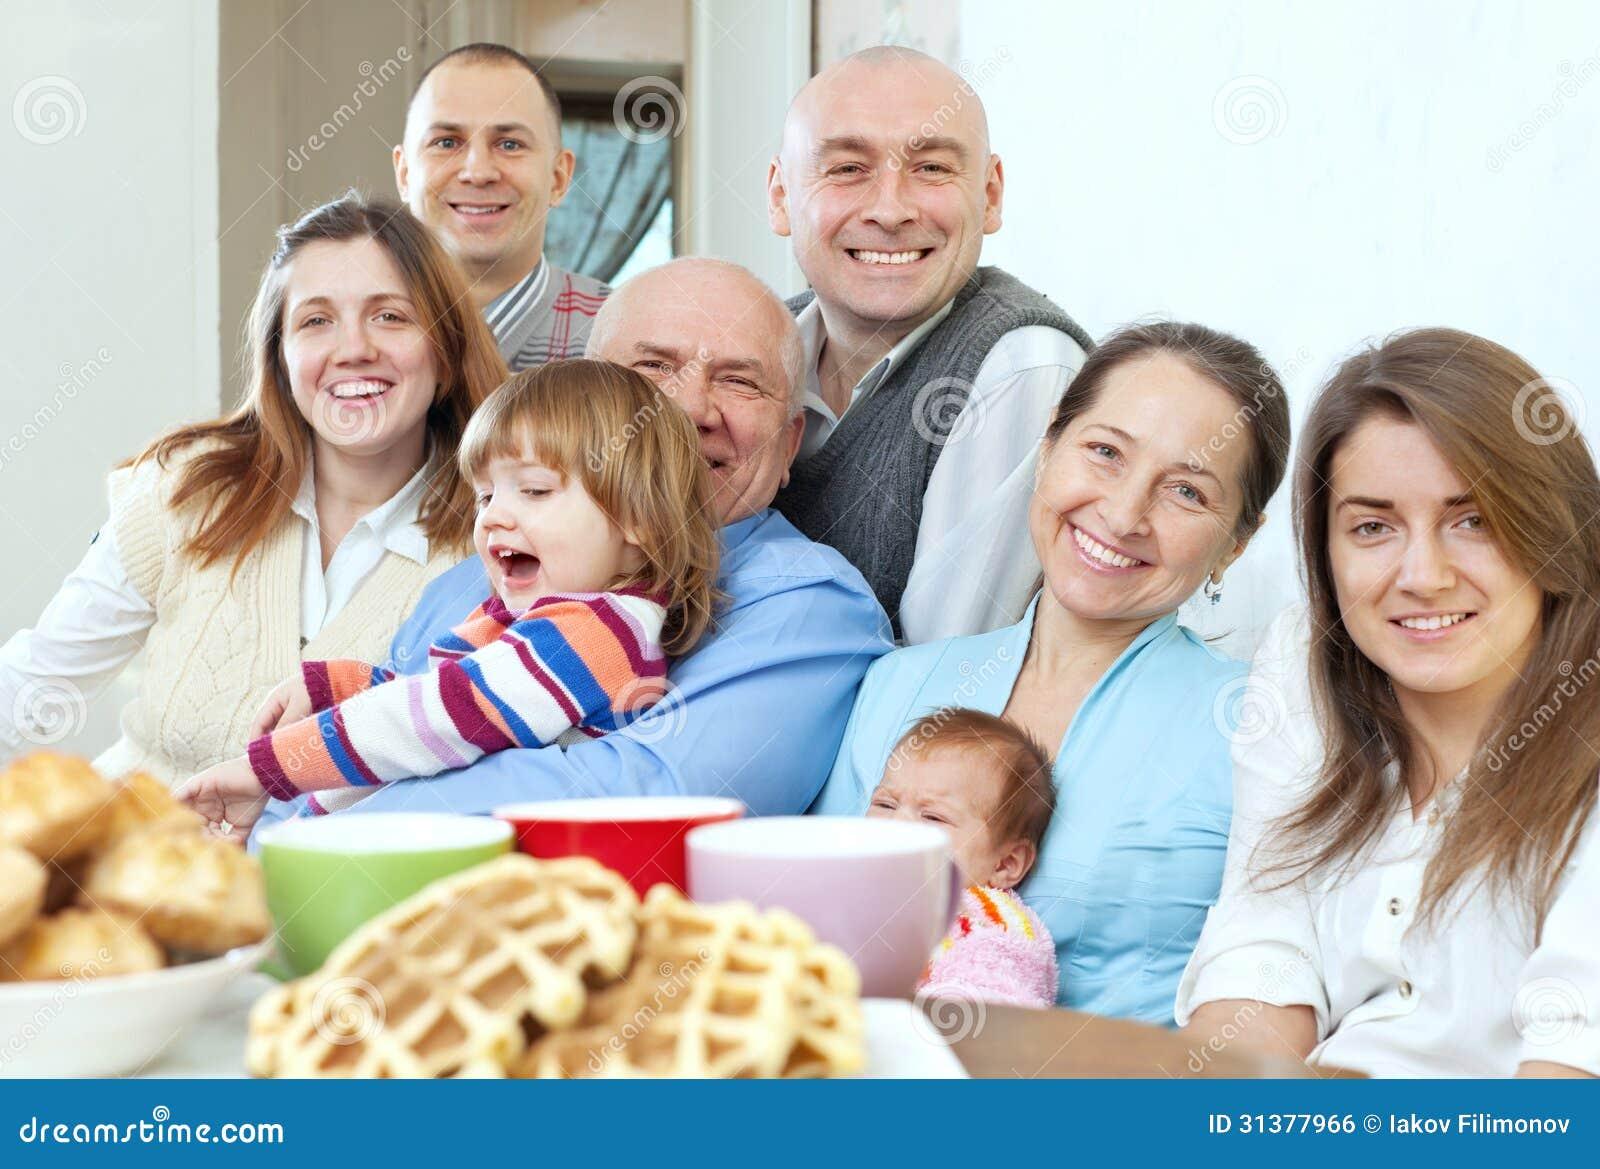 Large Happy Three Generations Family Royalty Free Stock